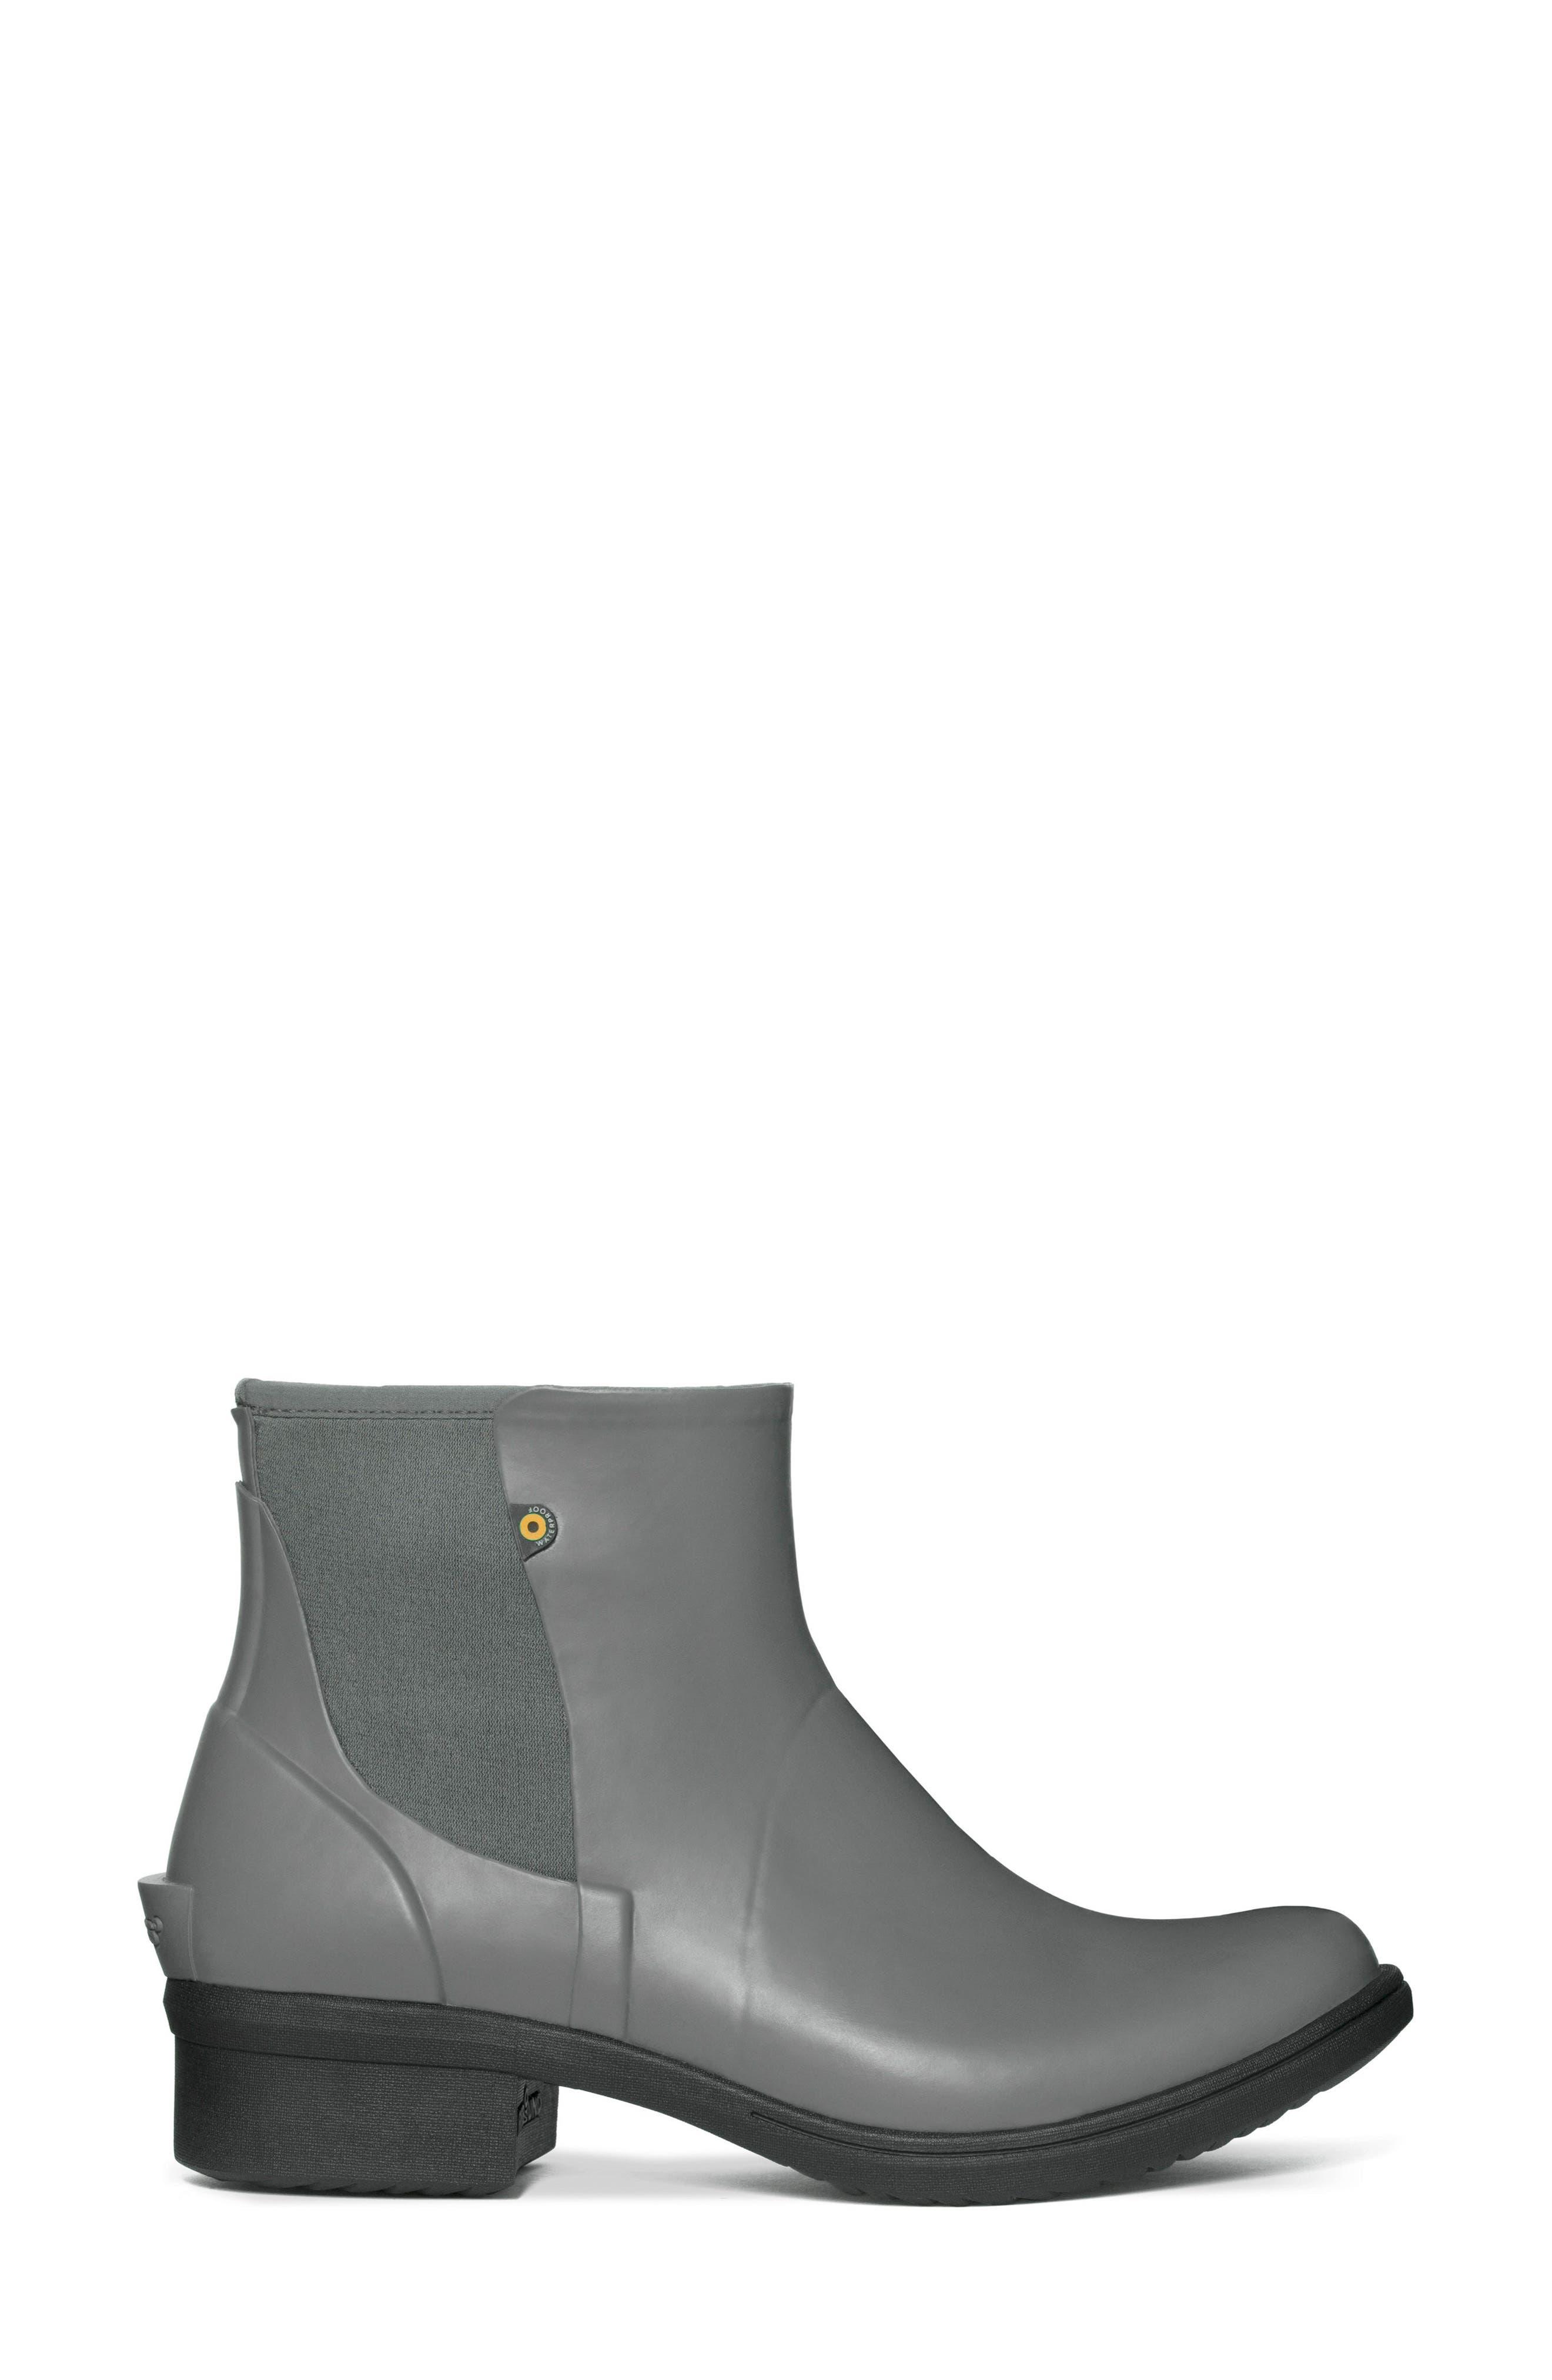 Auburn Insulated Waterproof Boot,                             Alternate thumbnail 3, color,                             Grey